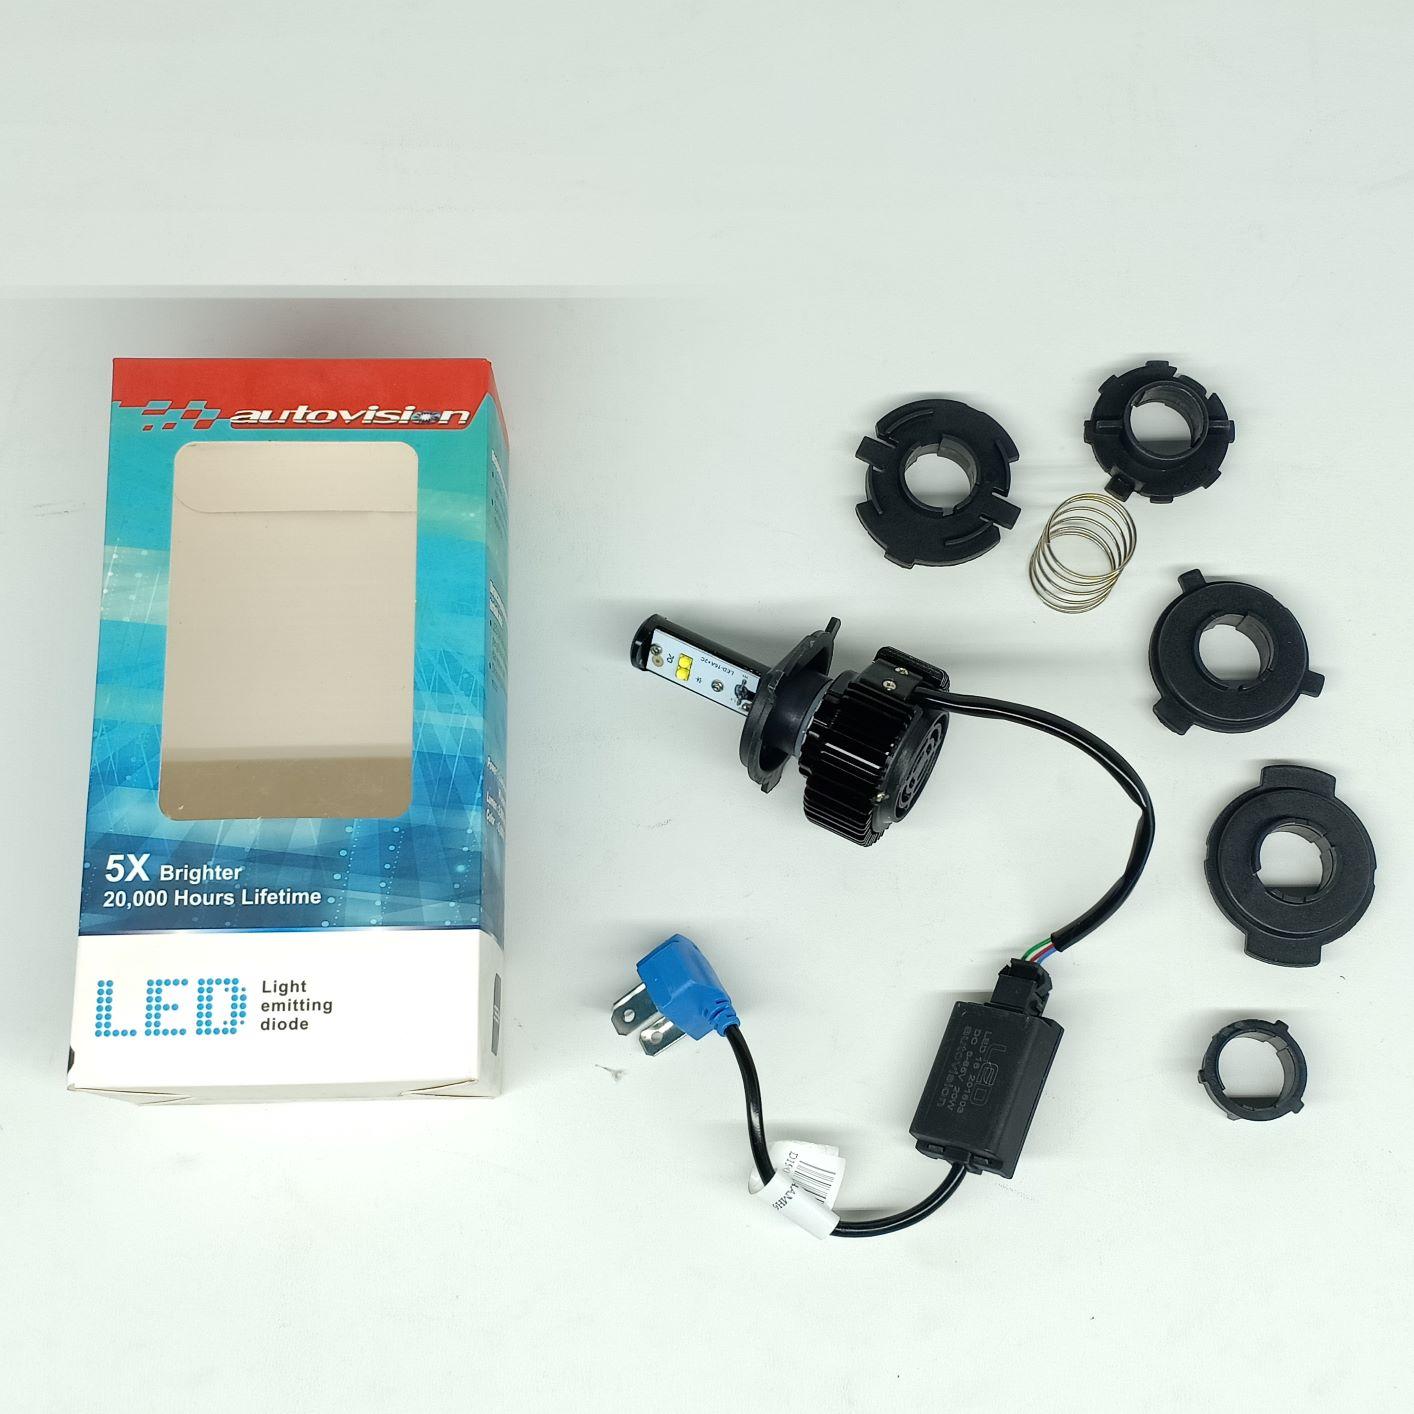 Autovision LED M5 H6 HS1 H4 DC12V 10/16W 6000K Putih Lampu Depan Motor